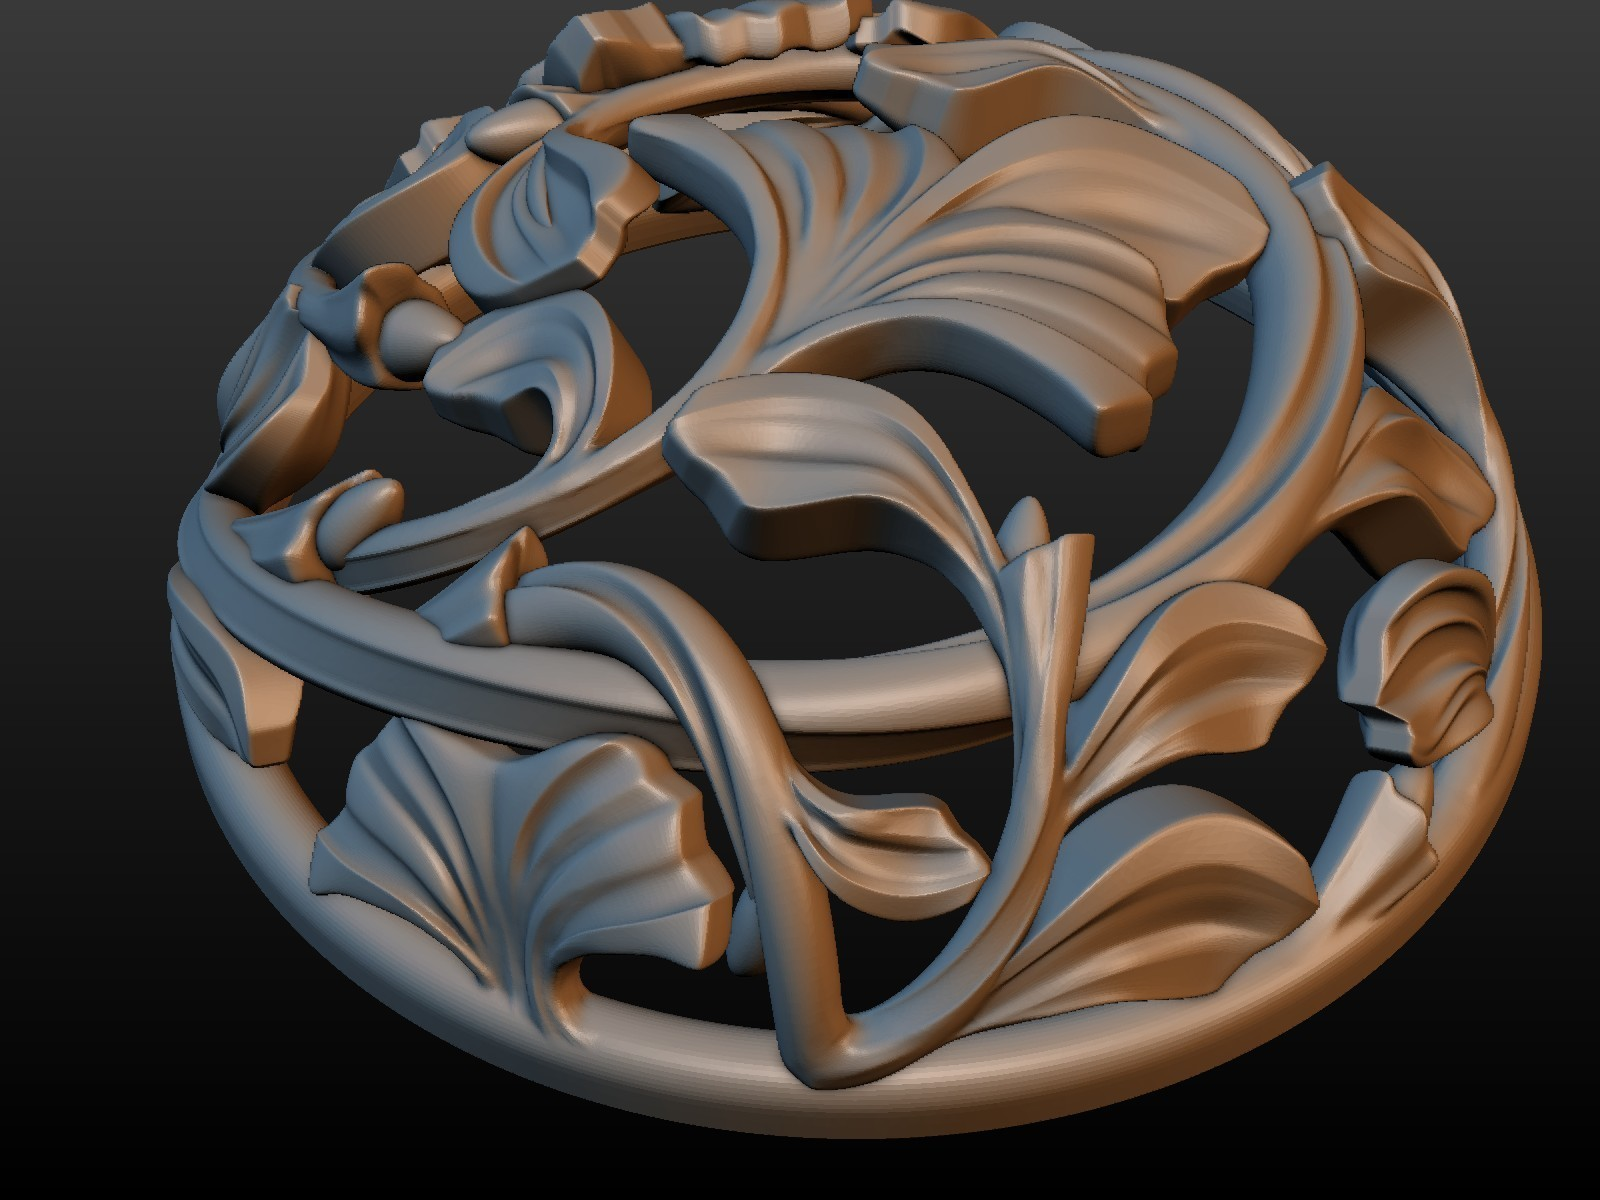 Earring-08.jpg Download STL file Earring • 3D printing template, Skazok